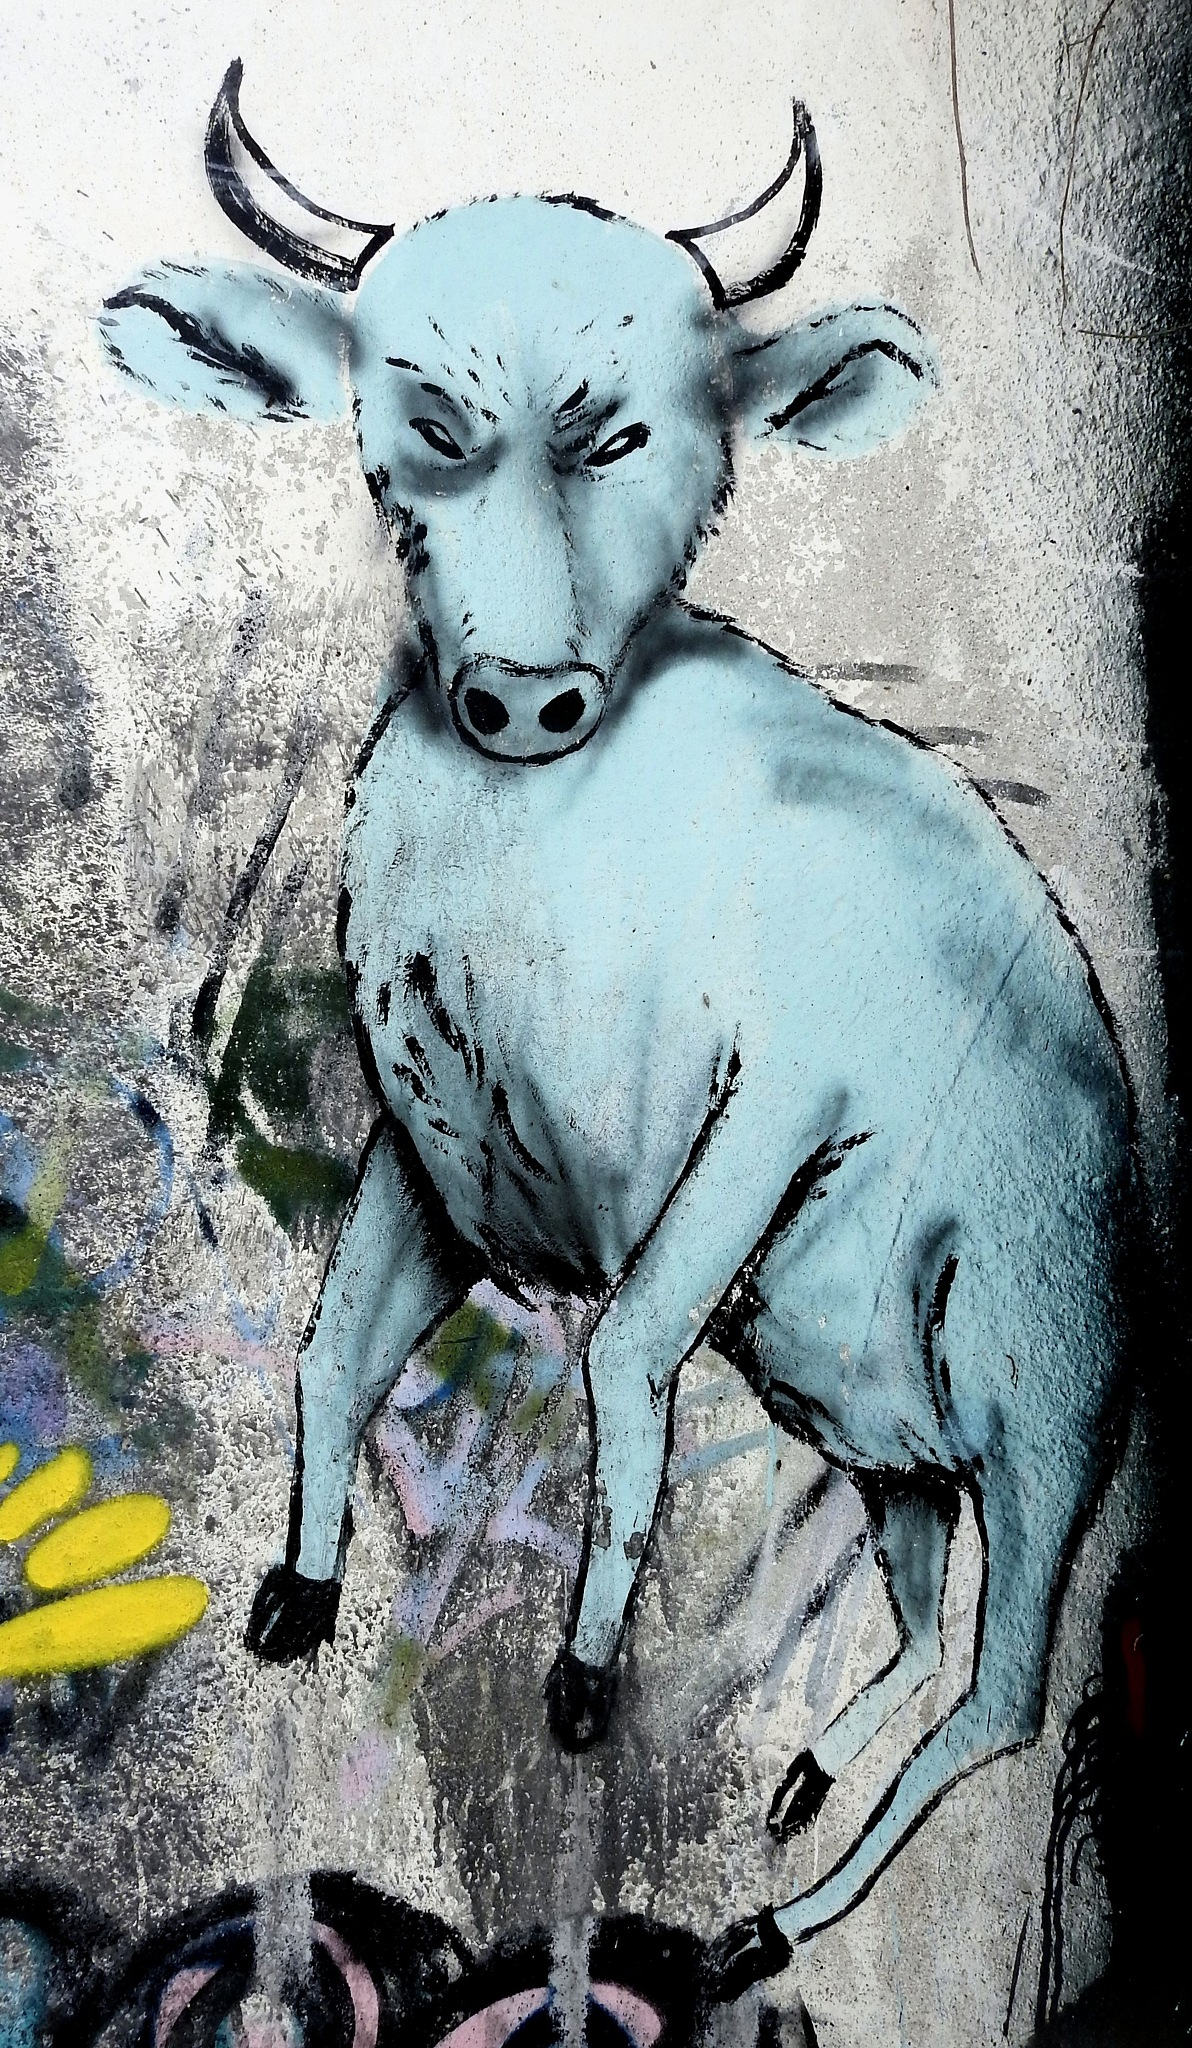 Napoli via Cupa del Poligono [Cavalleggeri d'Aosta] - The Blue Bull - 2 by Arnaldo De Lisio